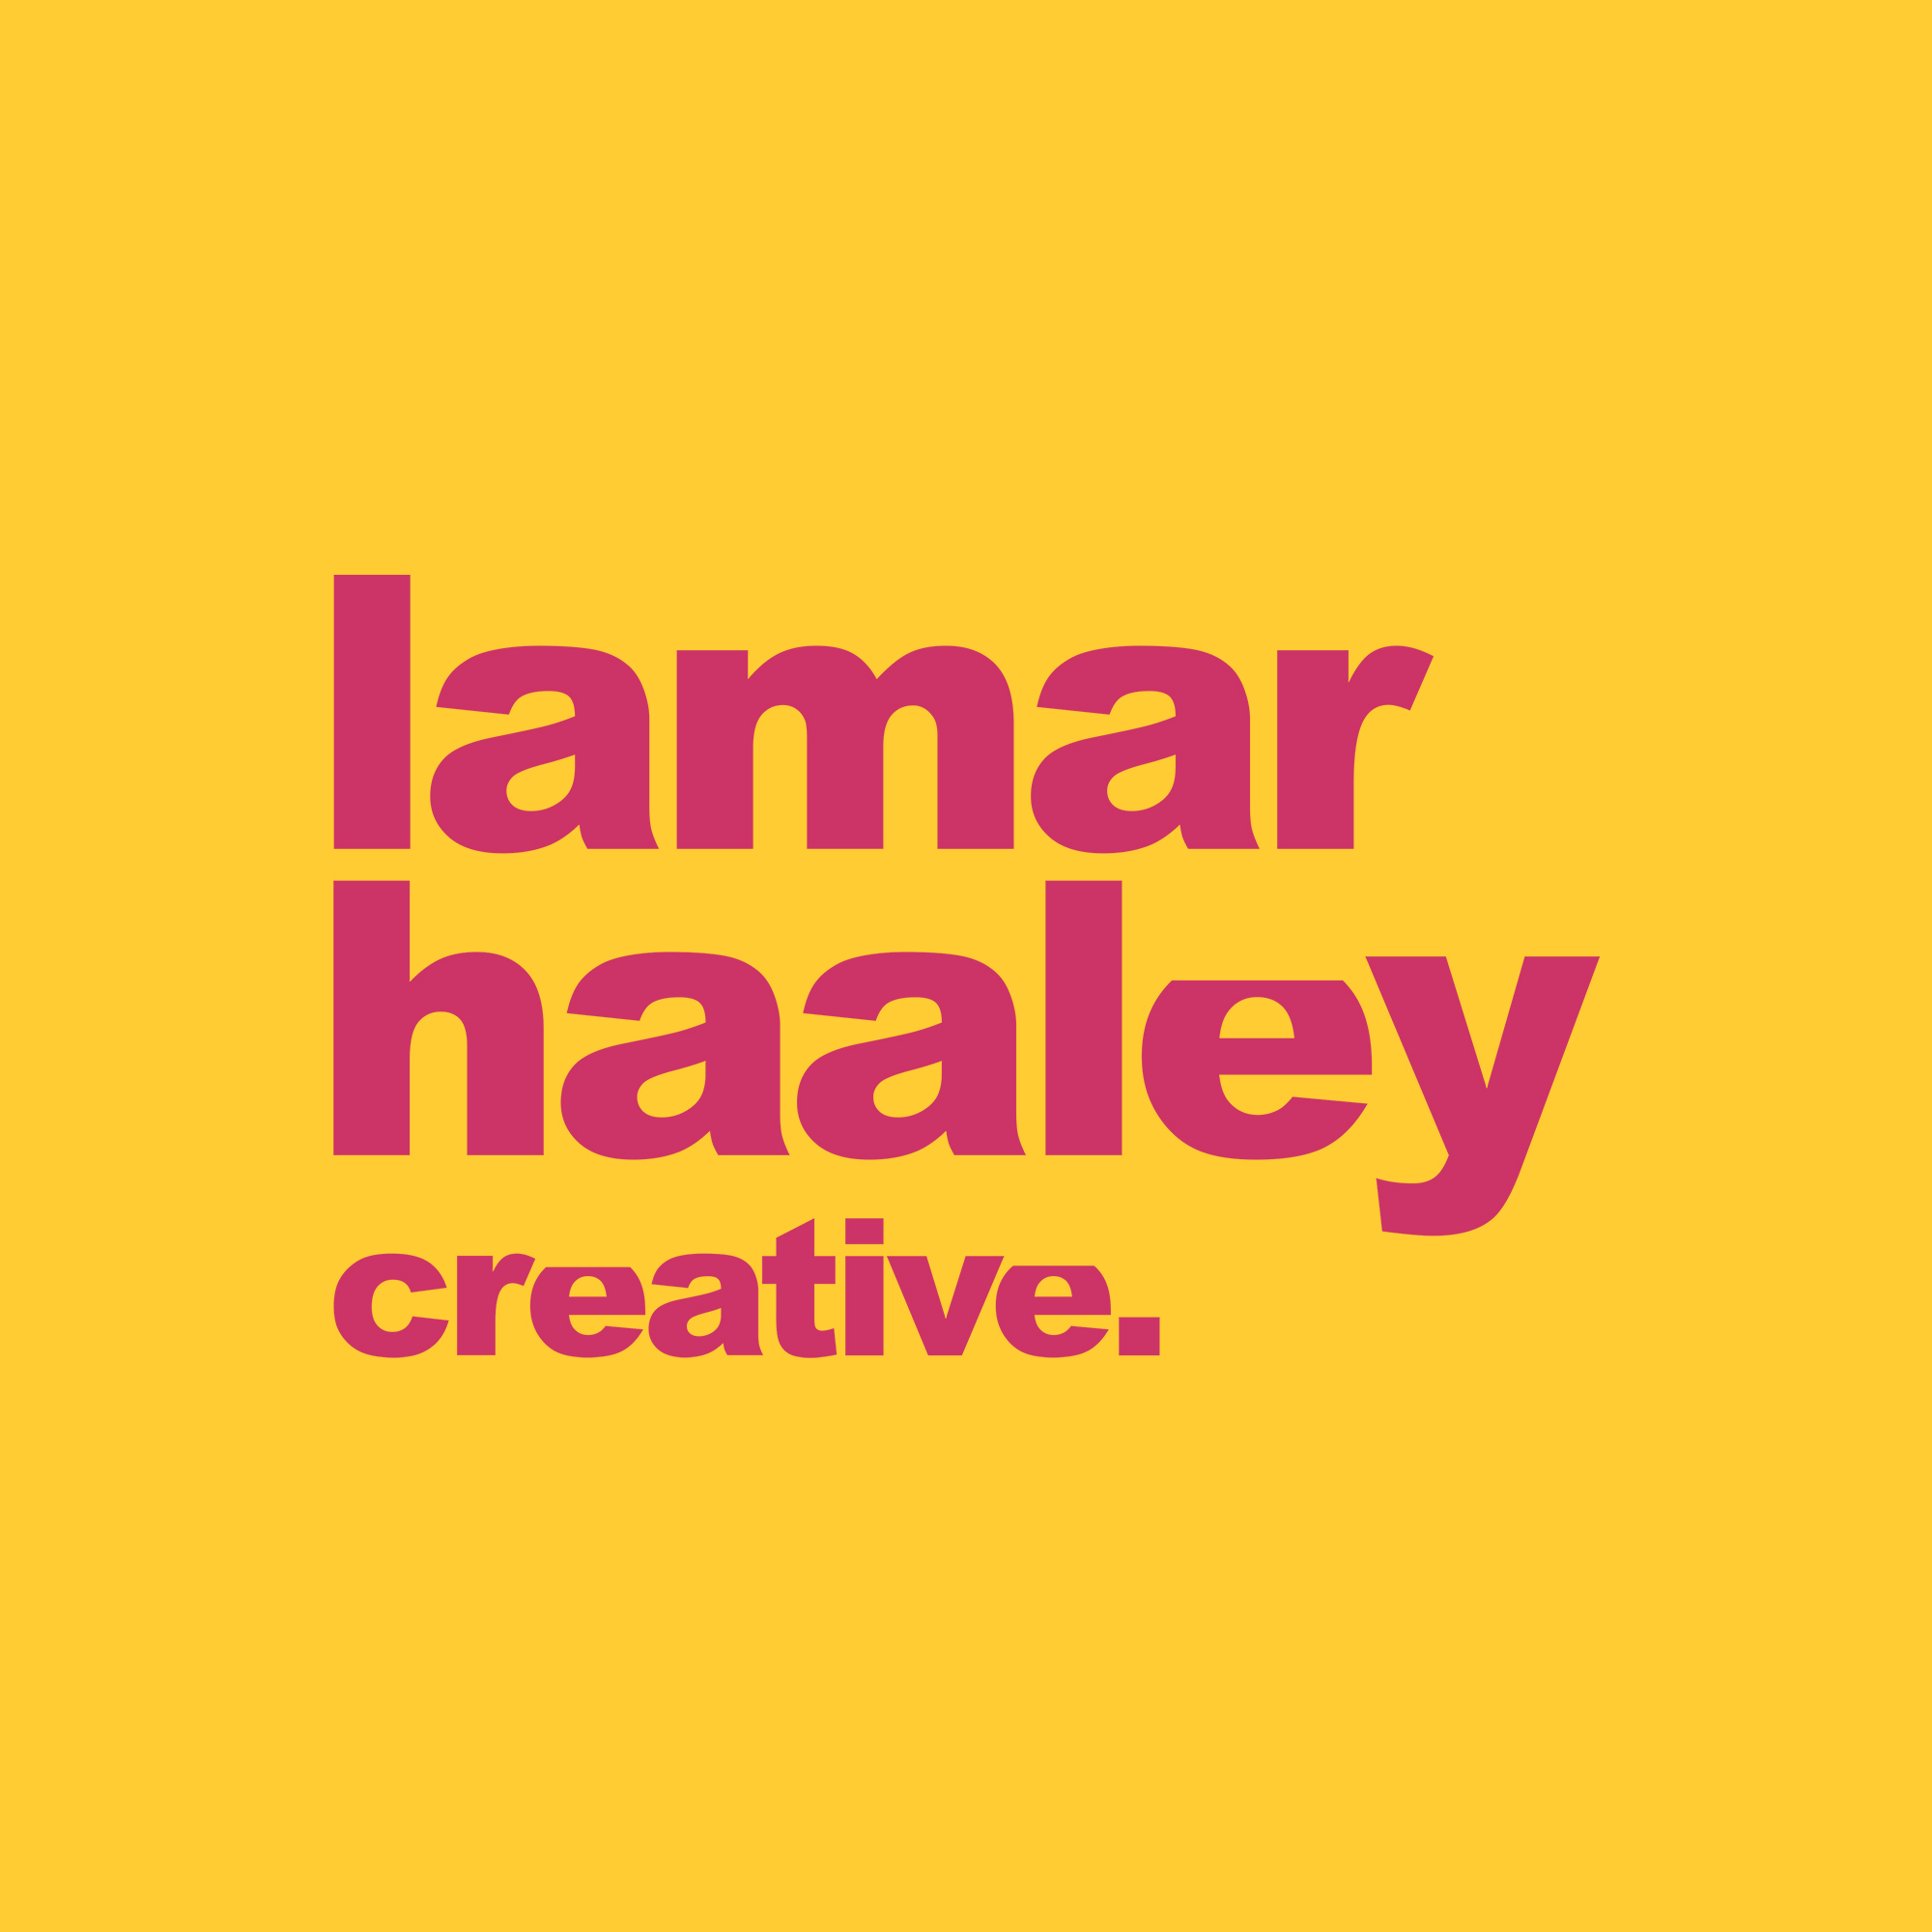 Lamar Haaley Creative - Square Display Photo.jpg